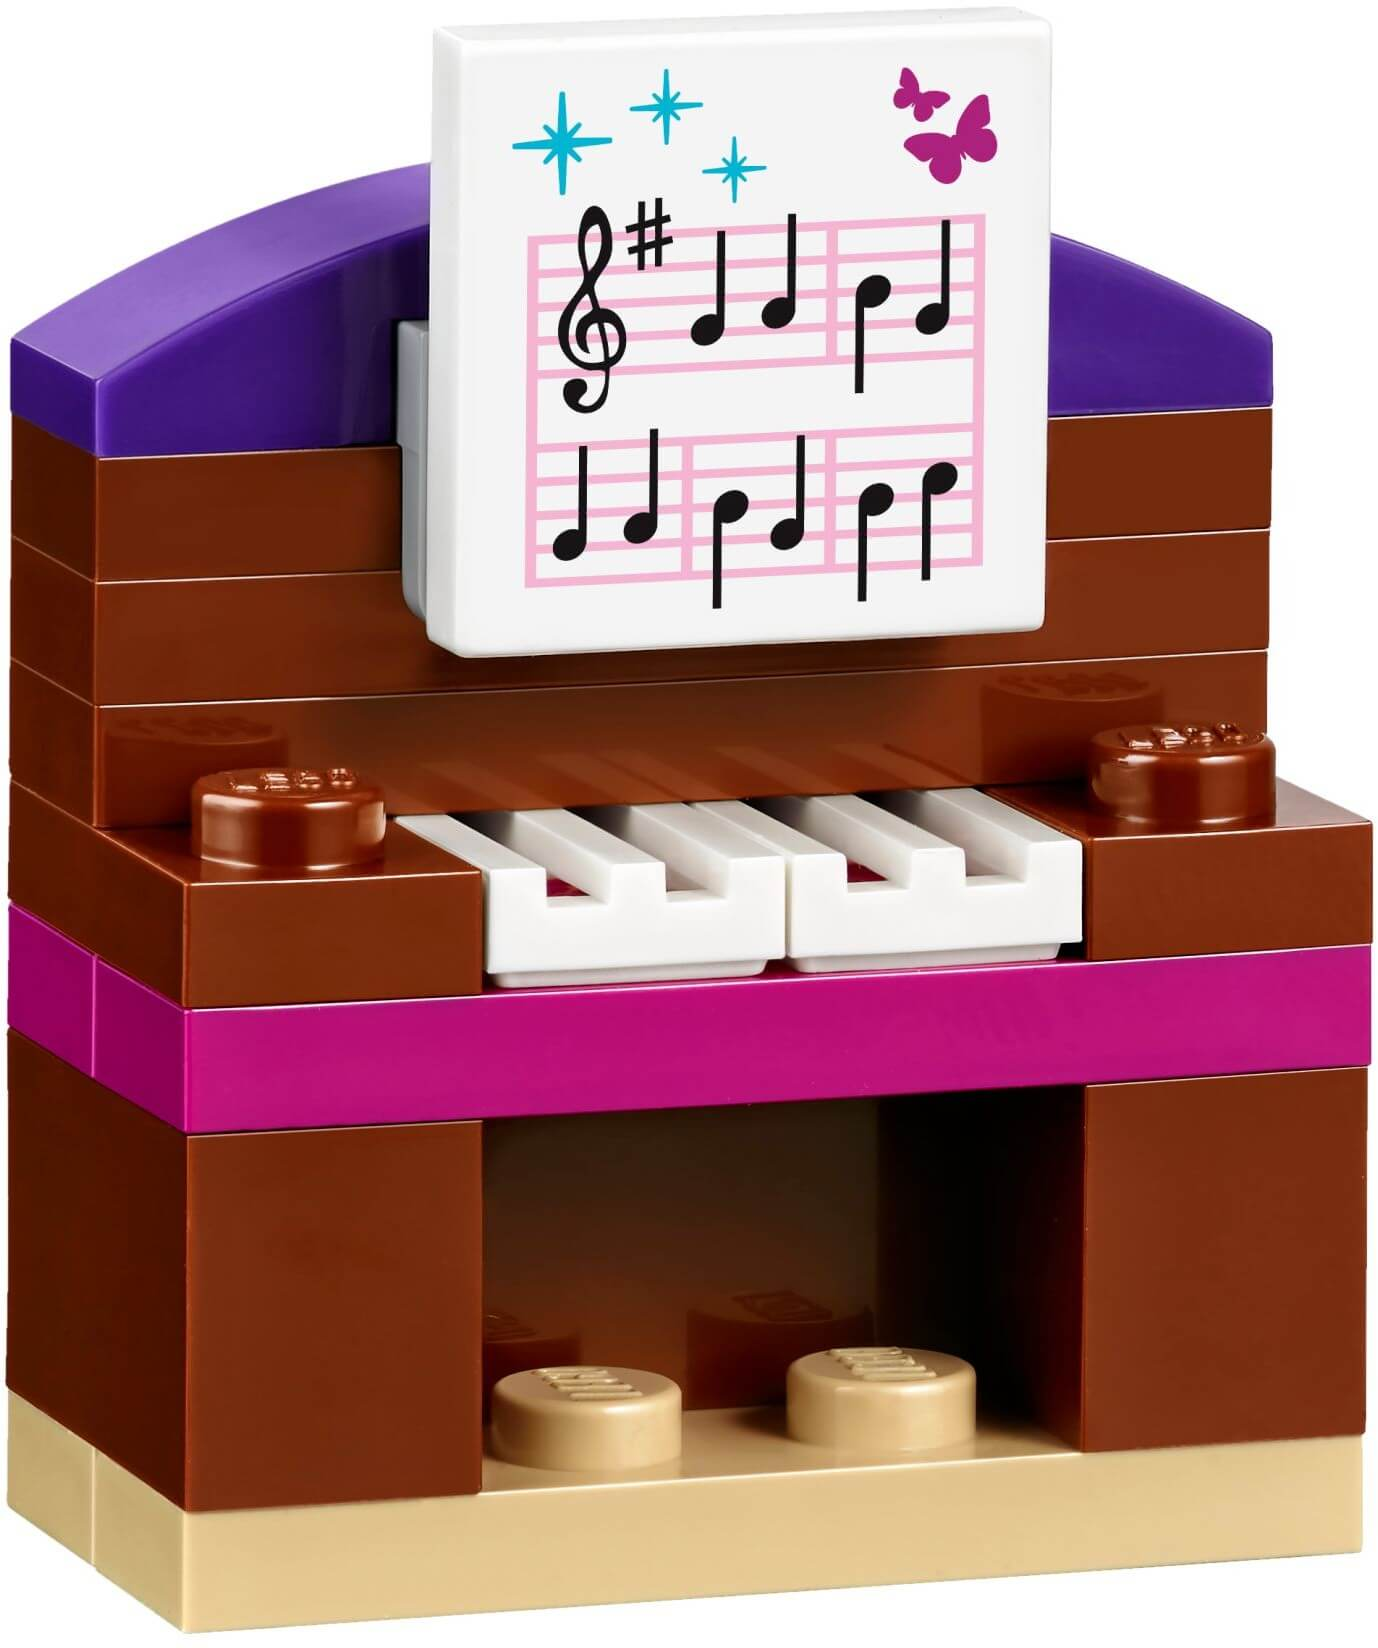 Mua đồ chơi LEGO 41131 - LEGO Friends 41131 - Căn Phòng Giáng Sinh (LEGO Friends Advent Calendar 41131)